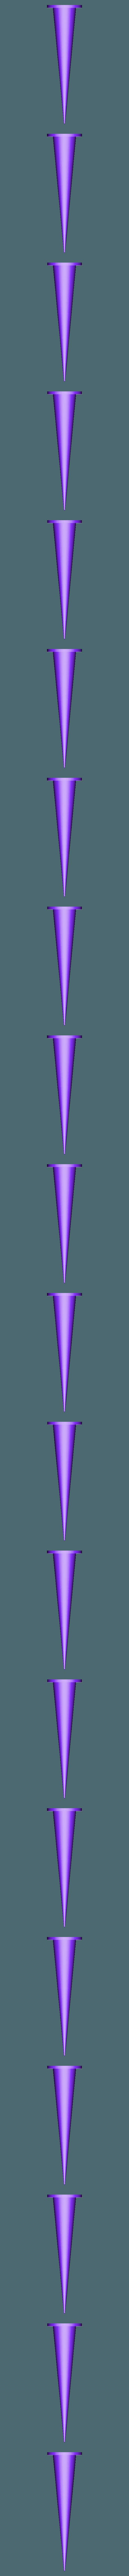 telescope_pins.stl Download free STL file Telescope calibration pins • 3D printable object, poblocki1982